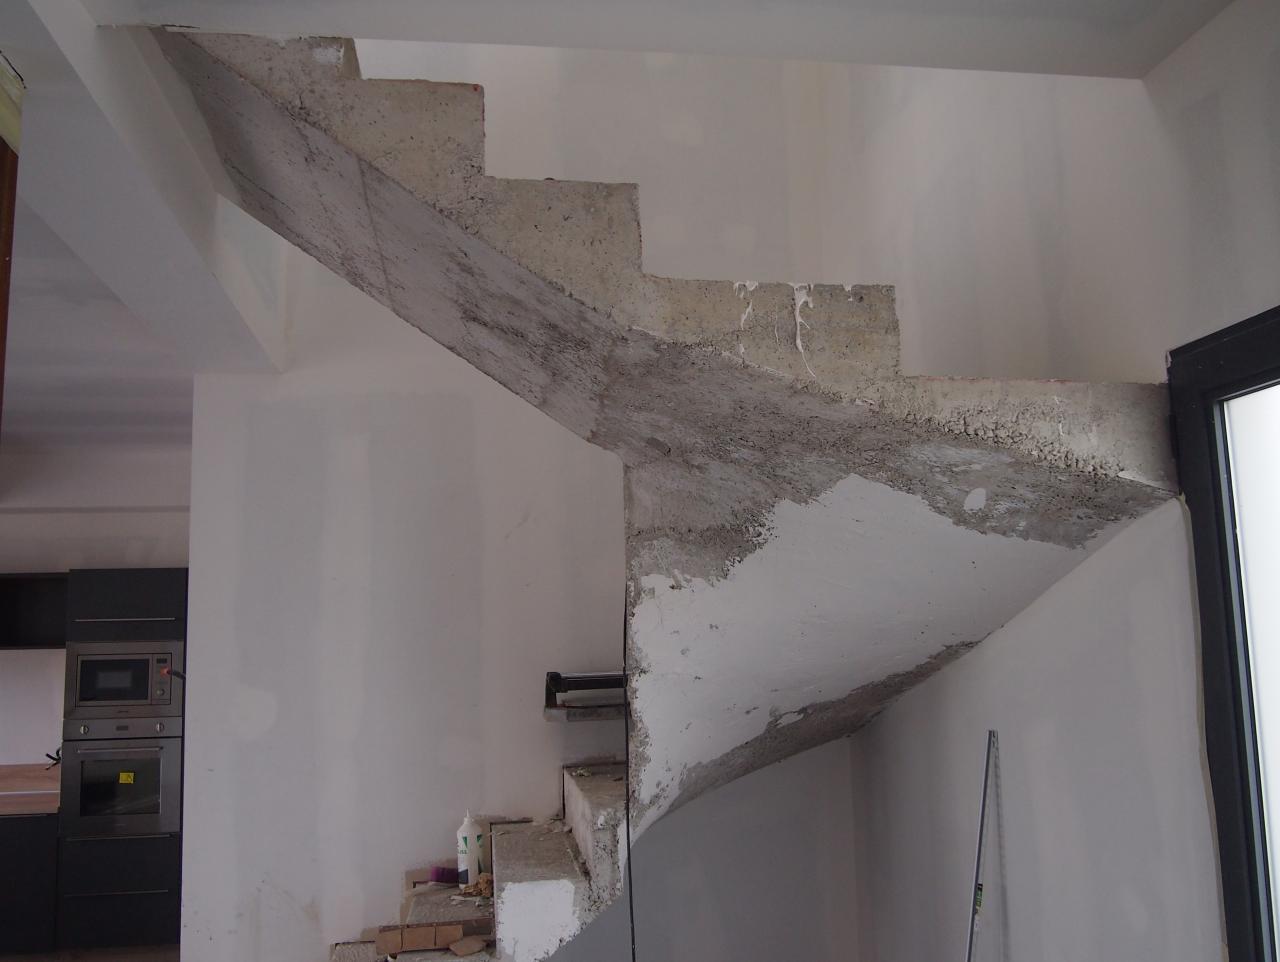 b ton cir taloch dans un escalier. Black Bedroom Furniture Sets. Home Design Ideas